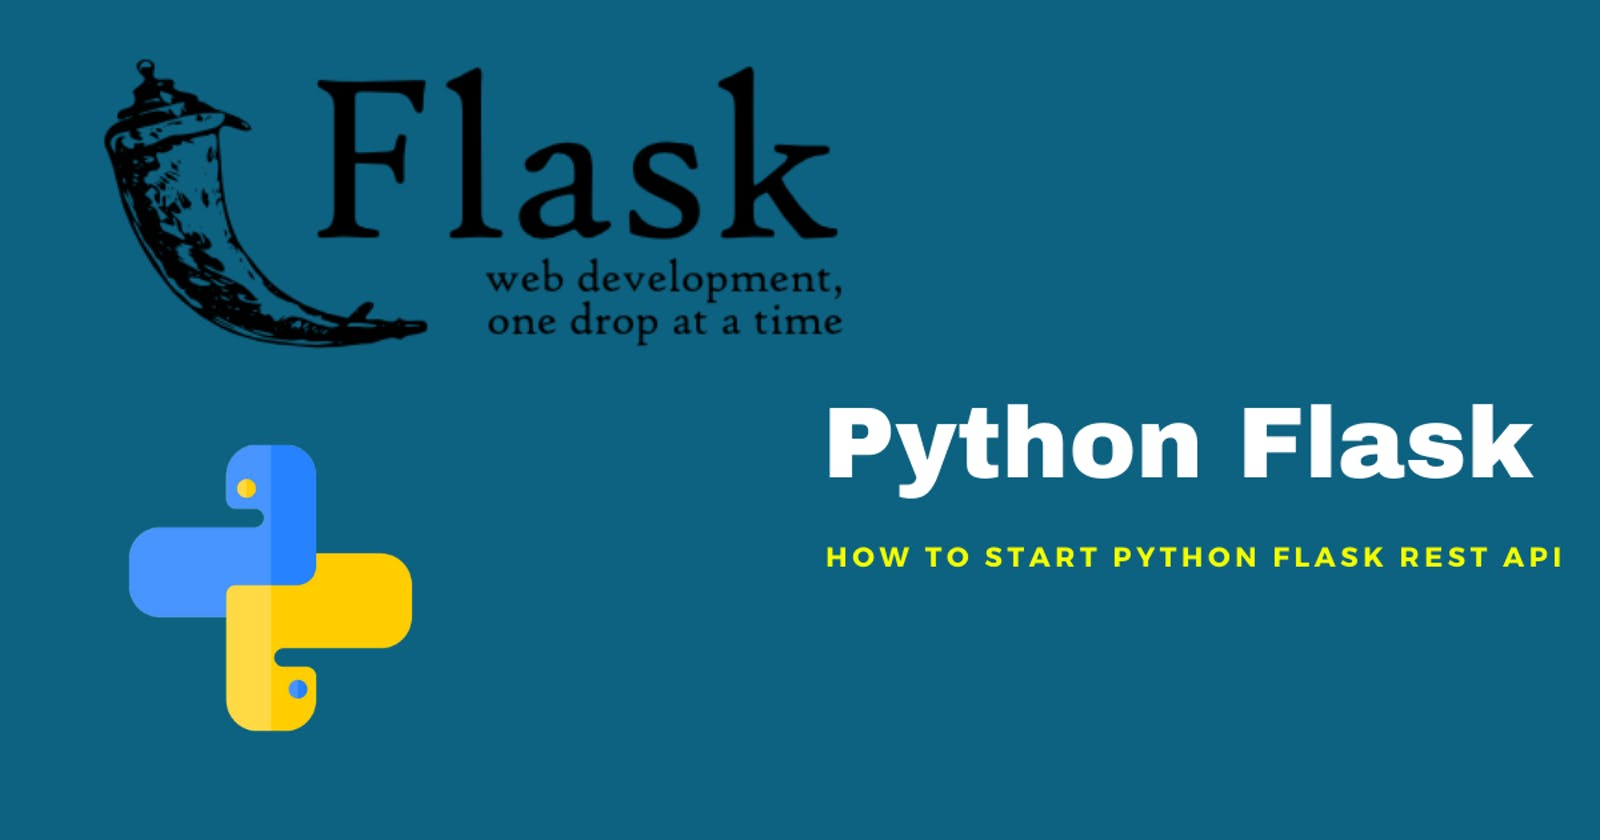 How to start Python Flask REST API